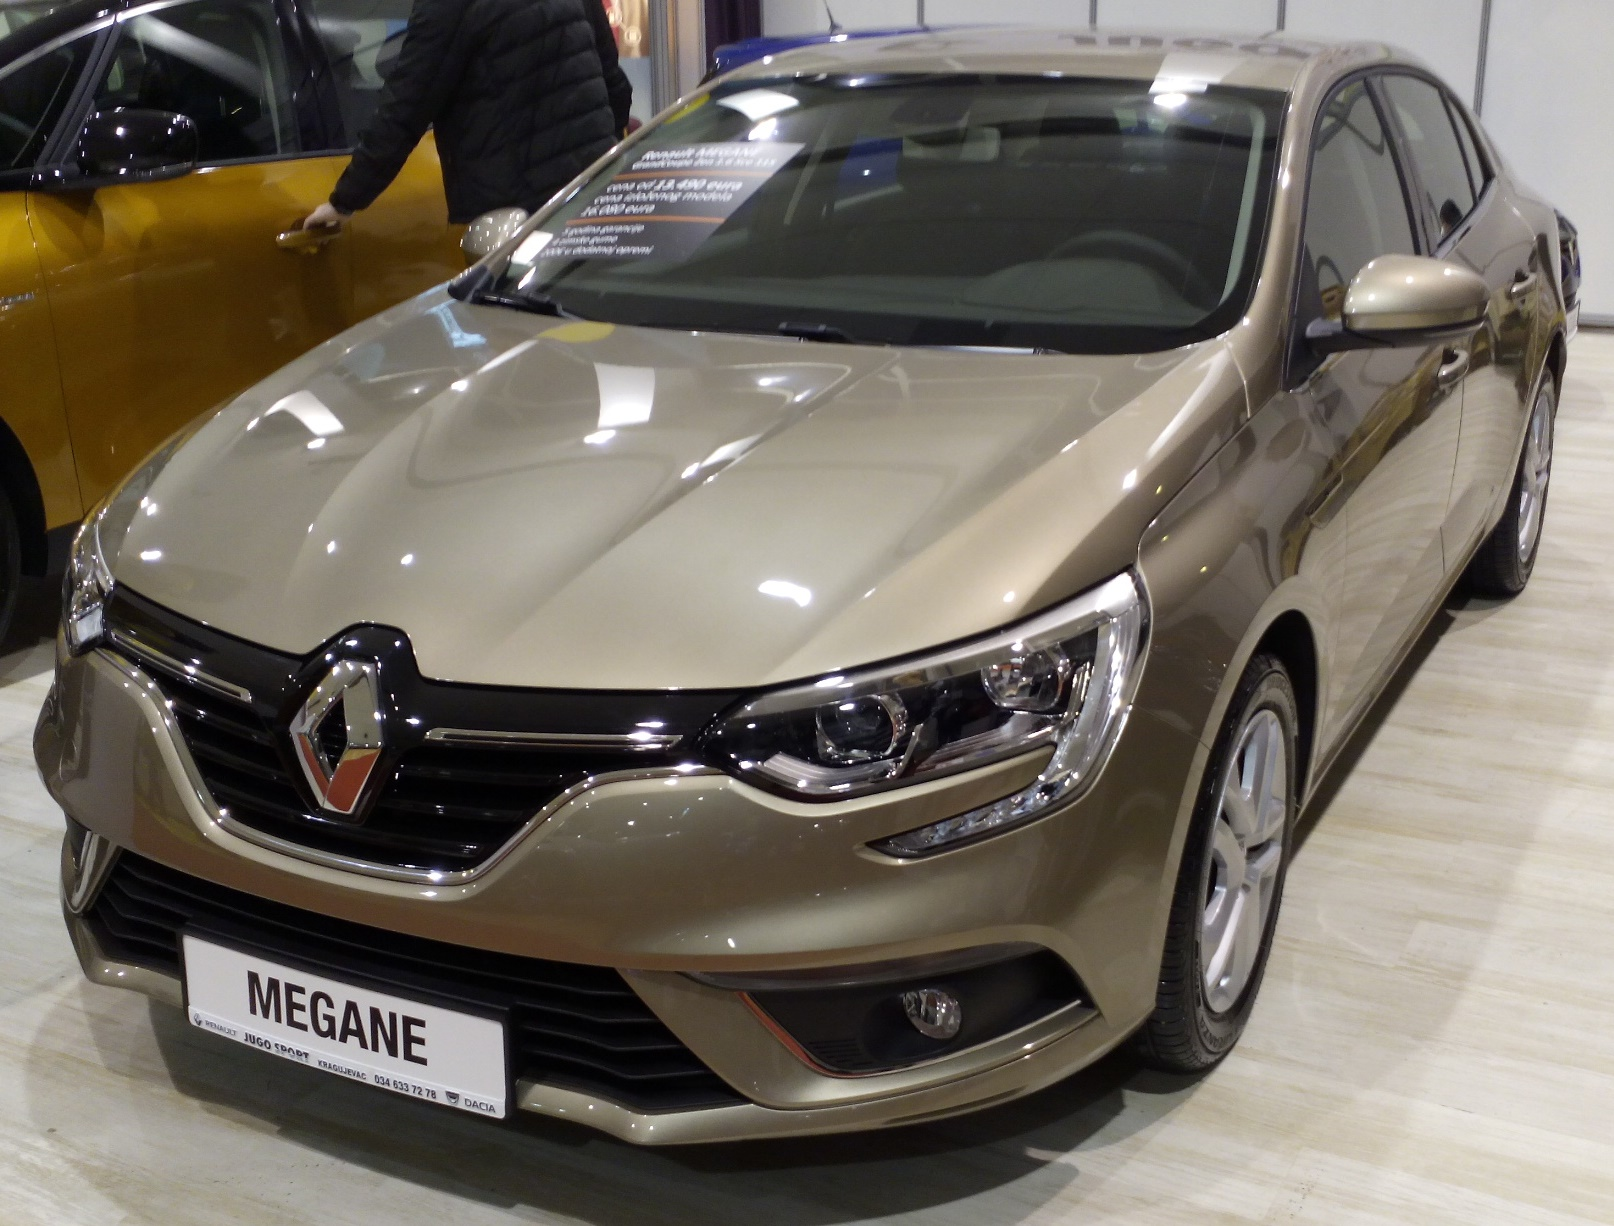 File:2018 Renault Megane Grandcoupe 1 6 SCe 115 Zen jpg